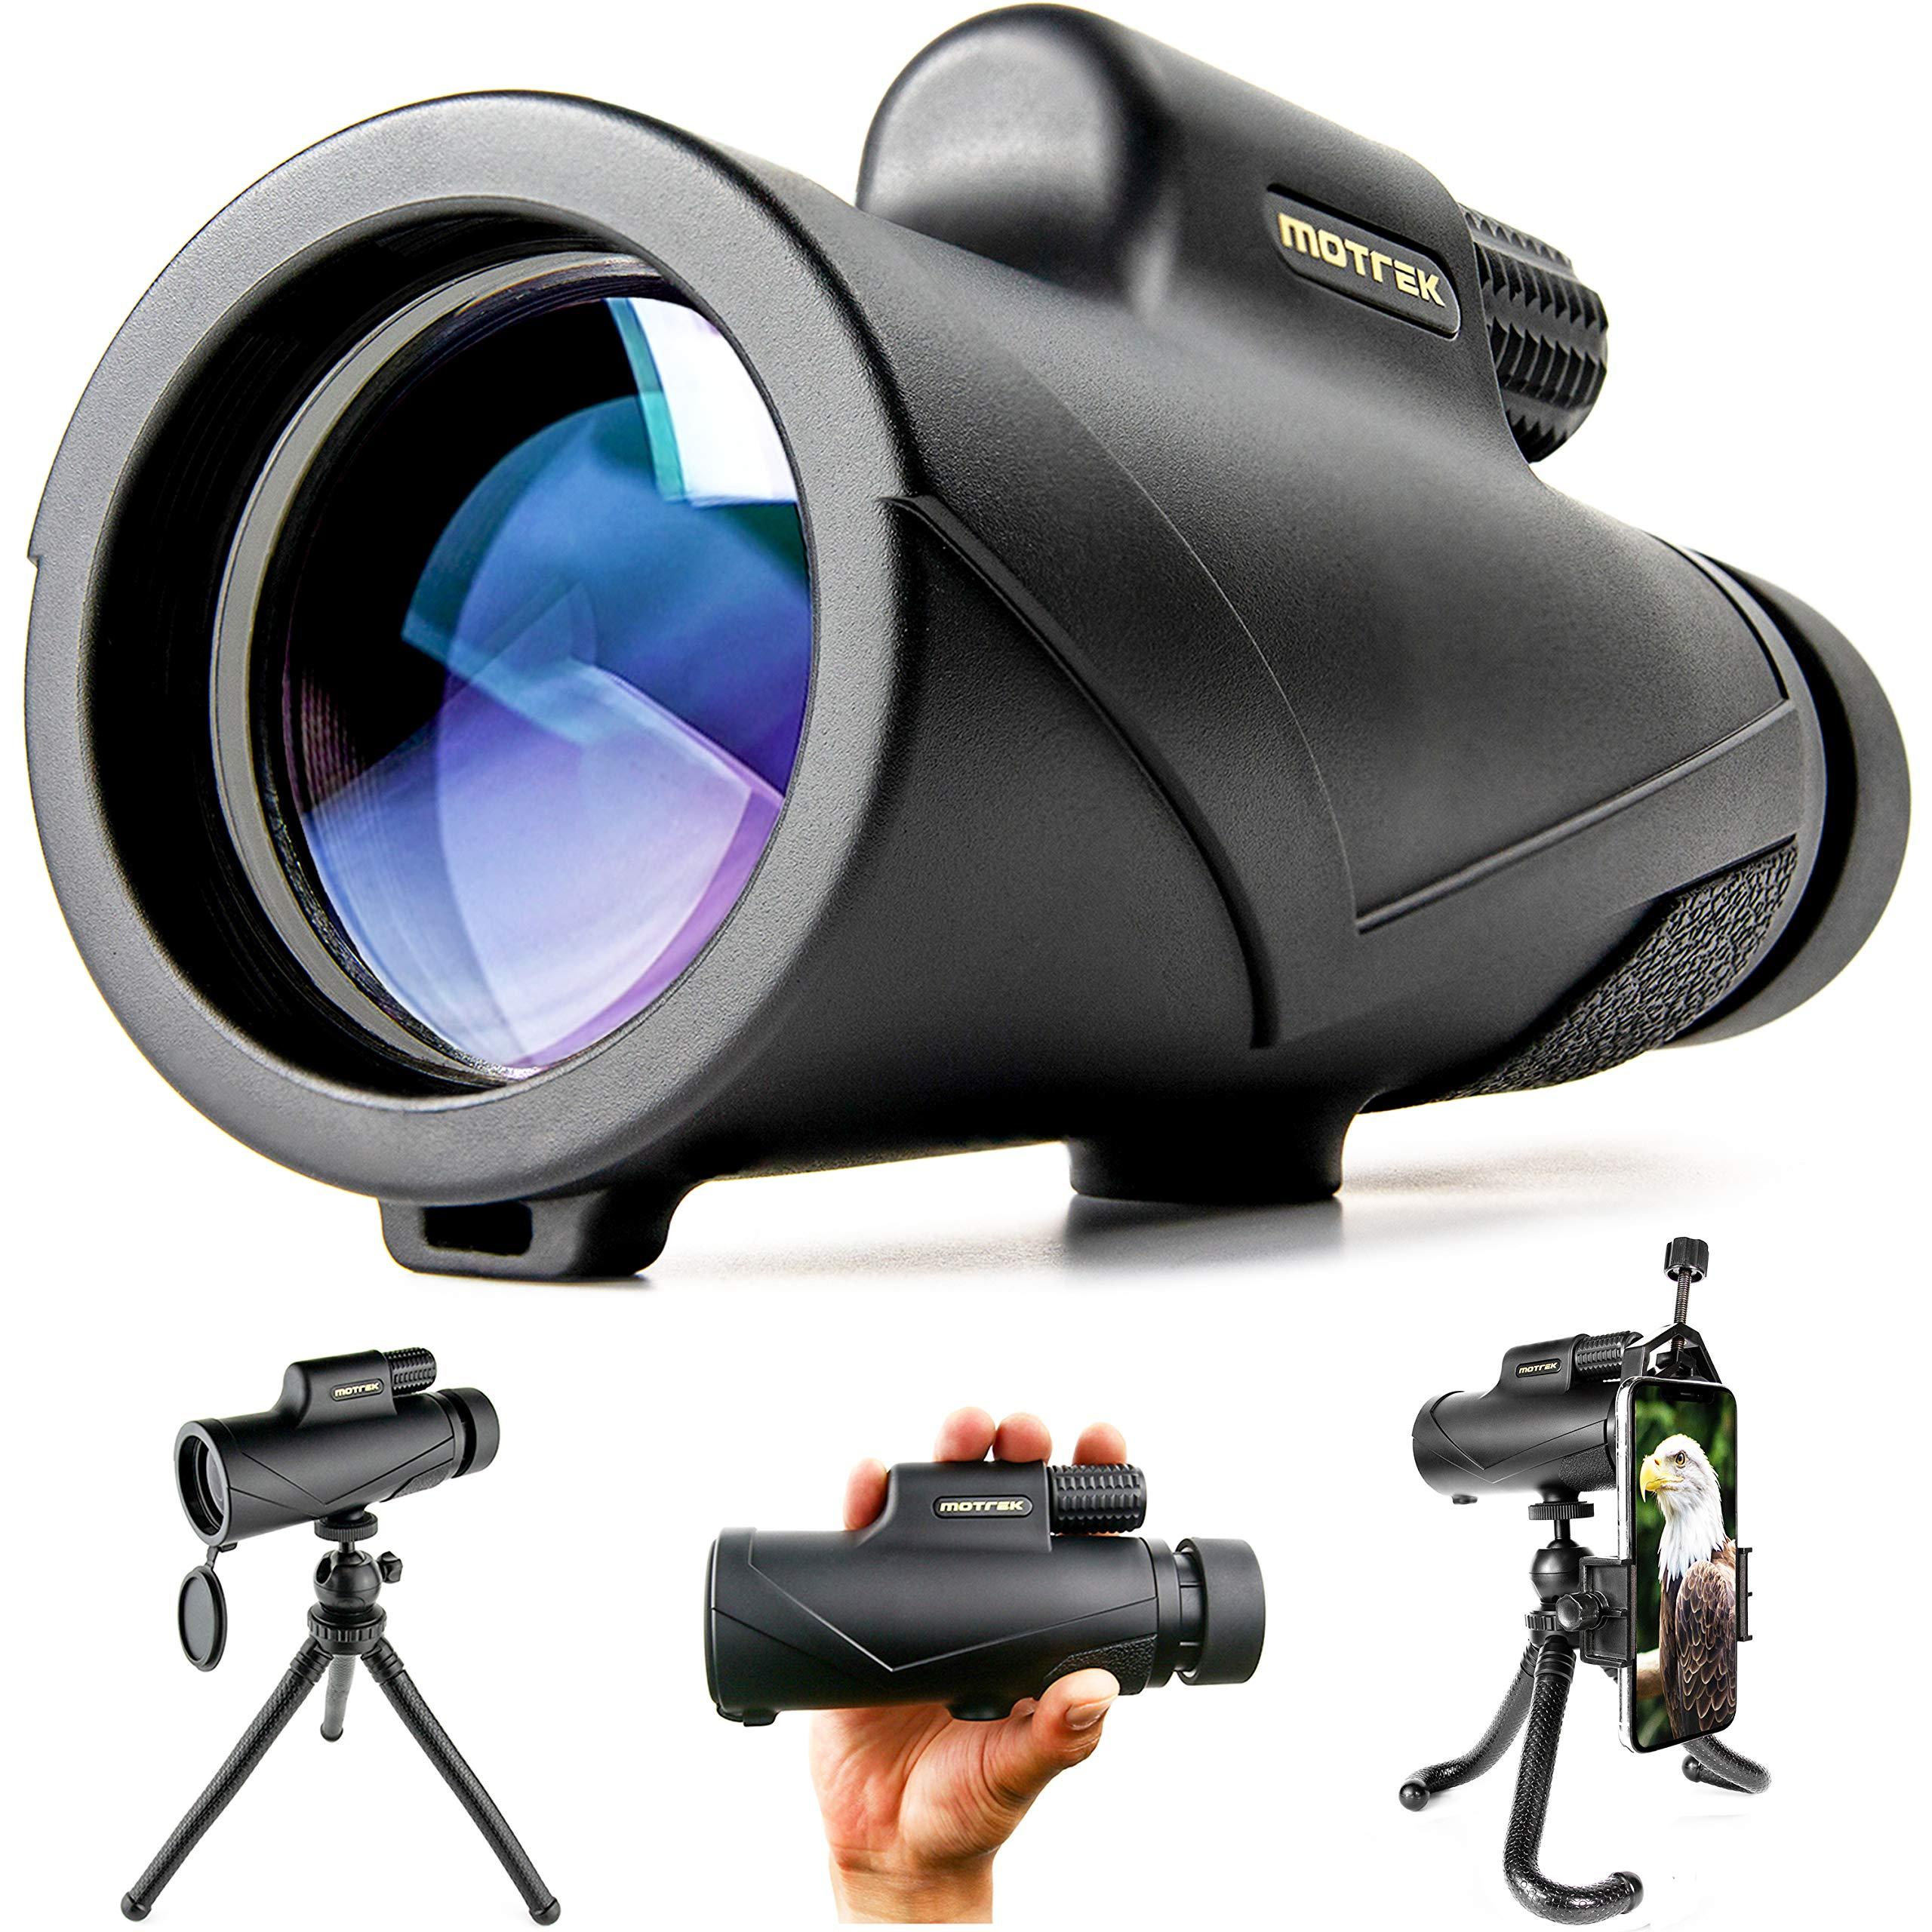 Monocular Telescope- 8x42 High Power HD with Smartphone Holder & Flexible Tripod- Waterproof FMC BAK4 Prism for Bird Watching, Camping, Hiking, Hunting- Adults & Kids- MOTREK by MOTREK